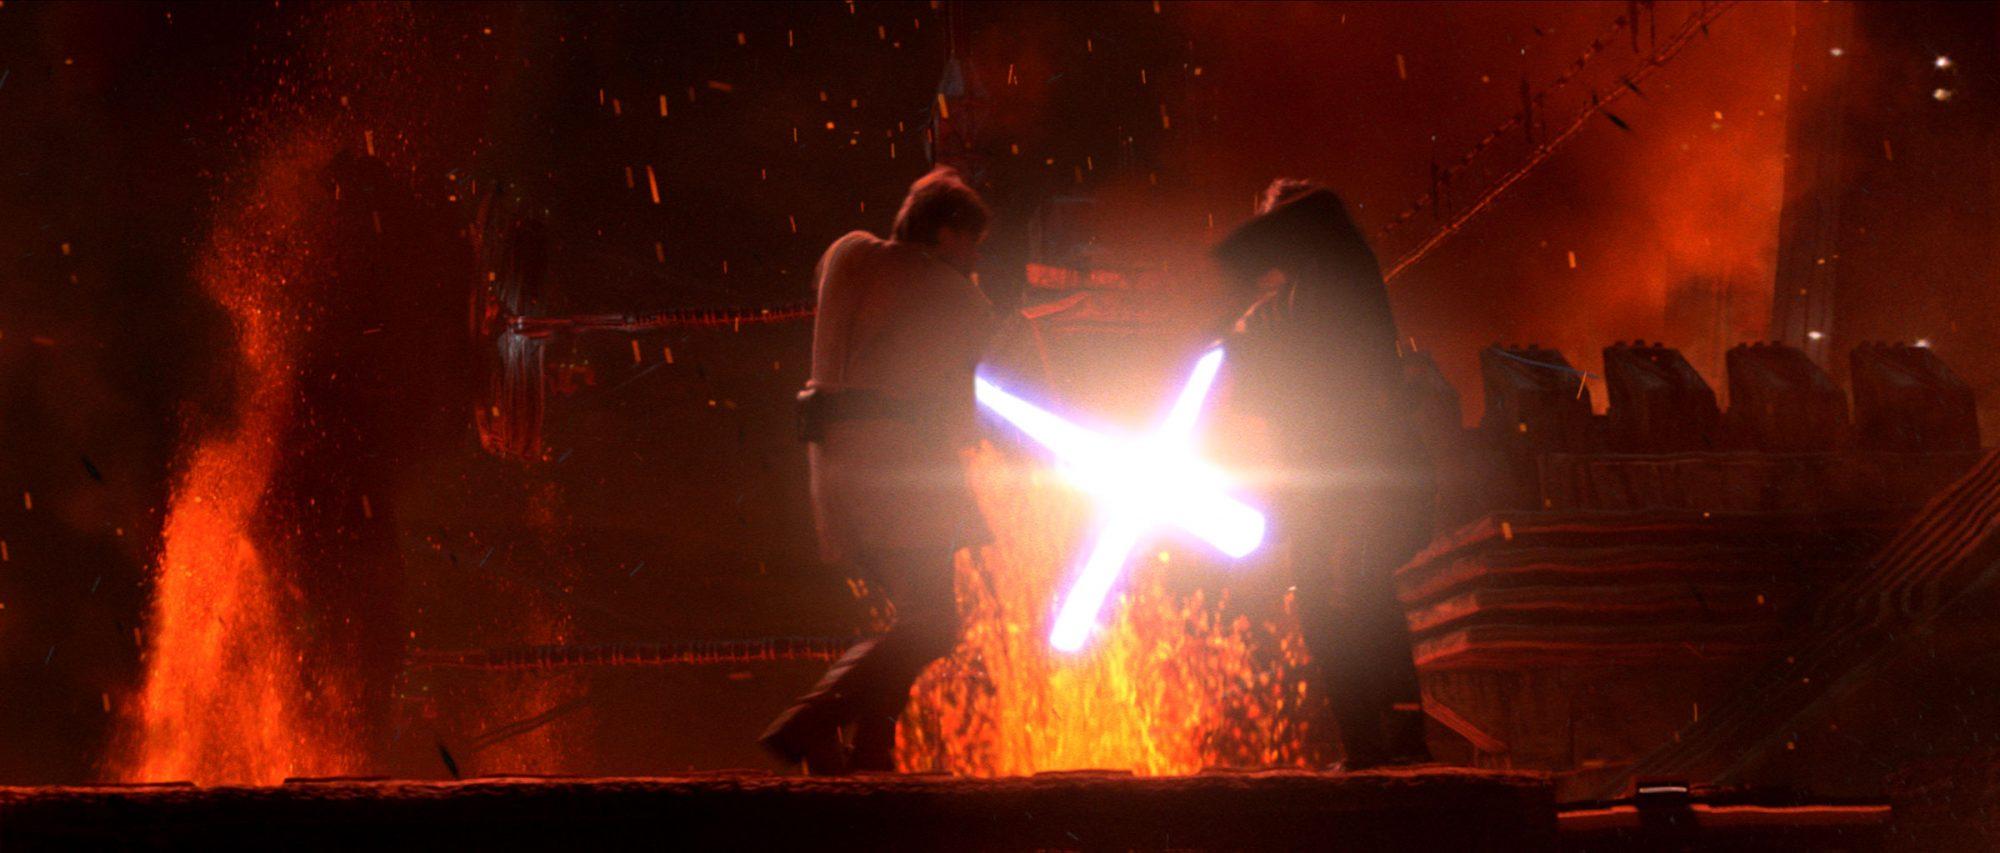 The Best Star Wars Lightsaber Battles Ranked Ew Com